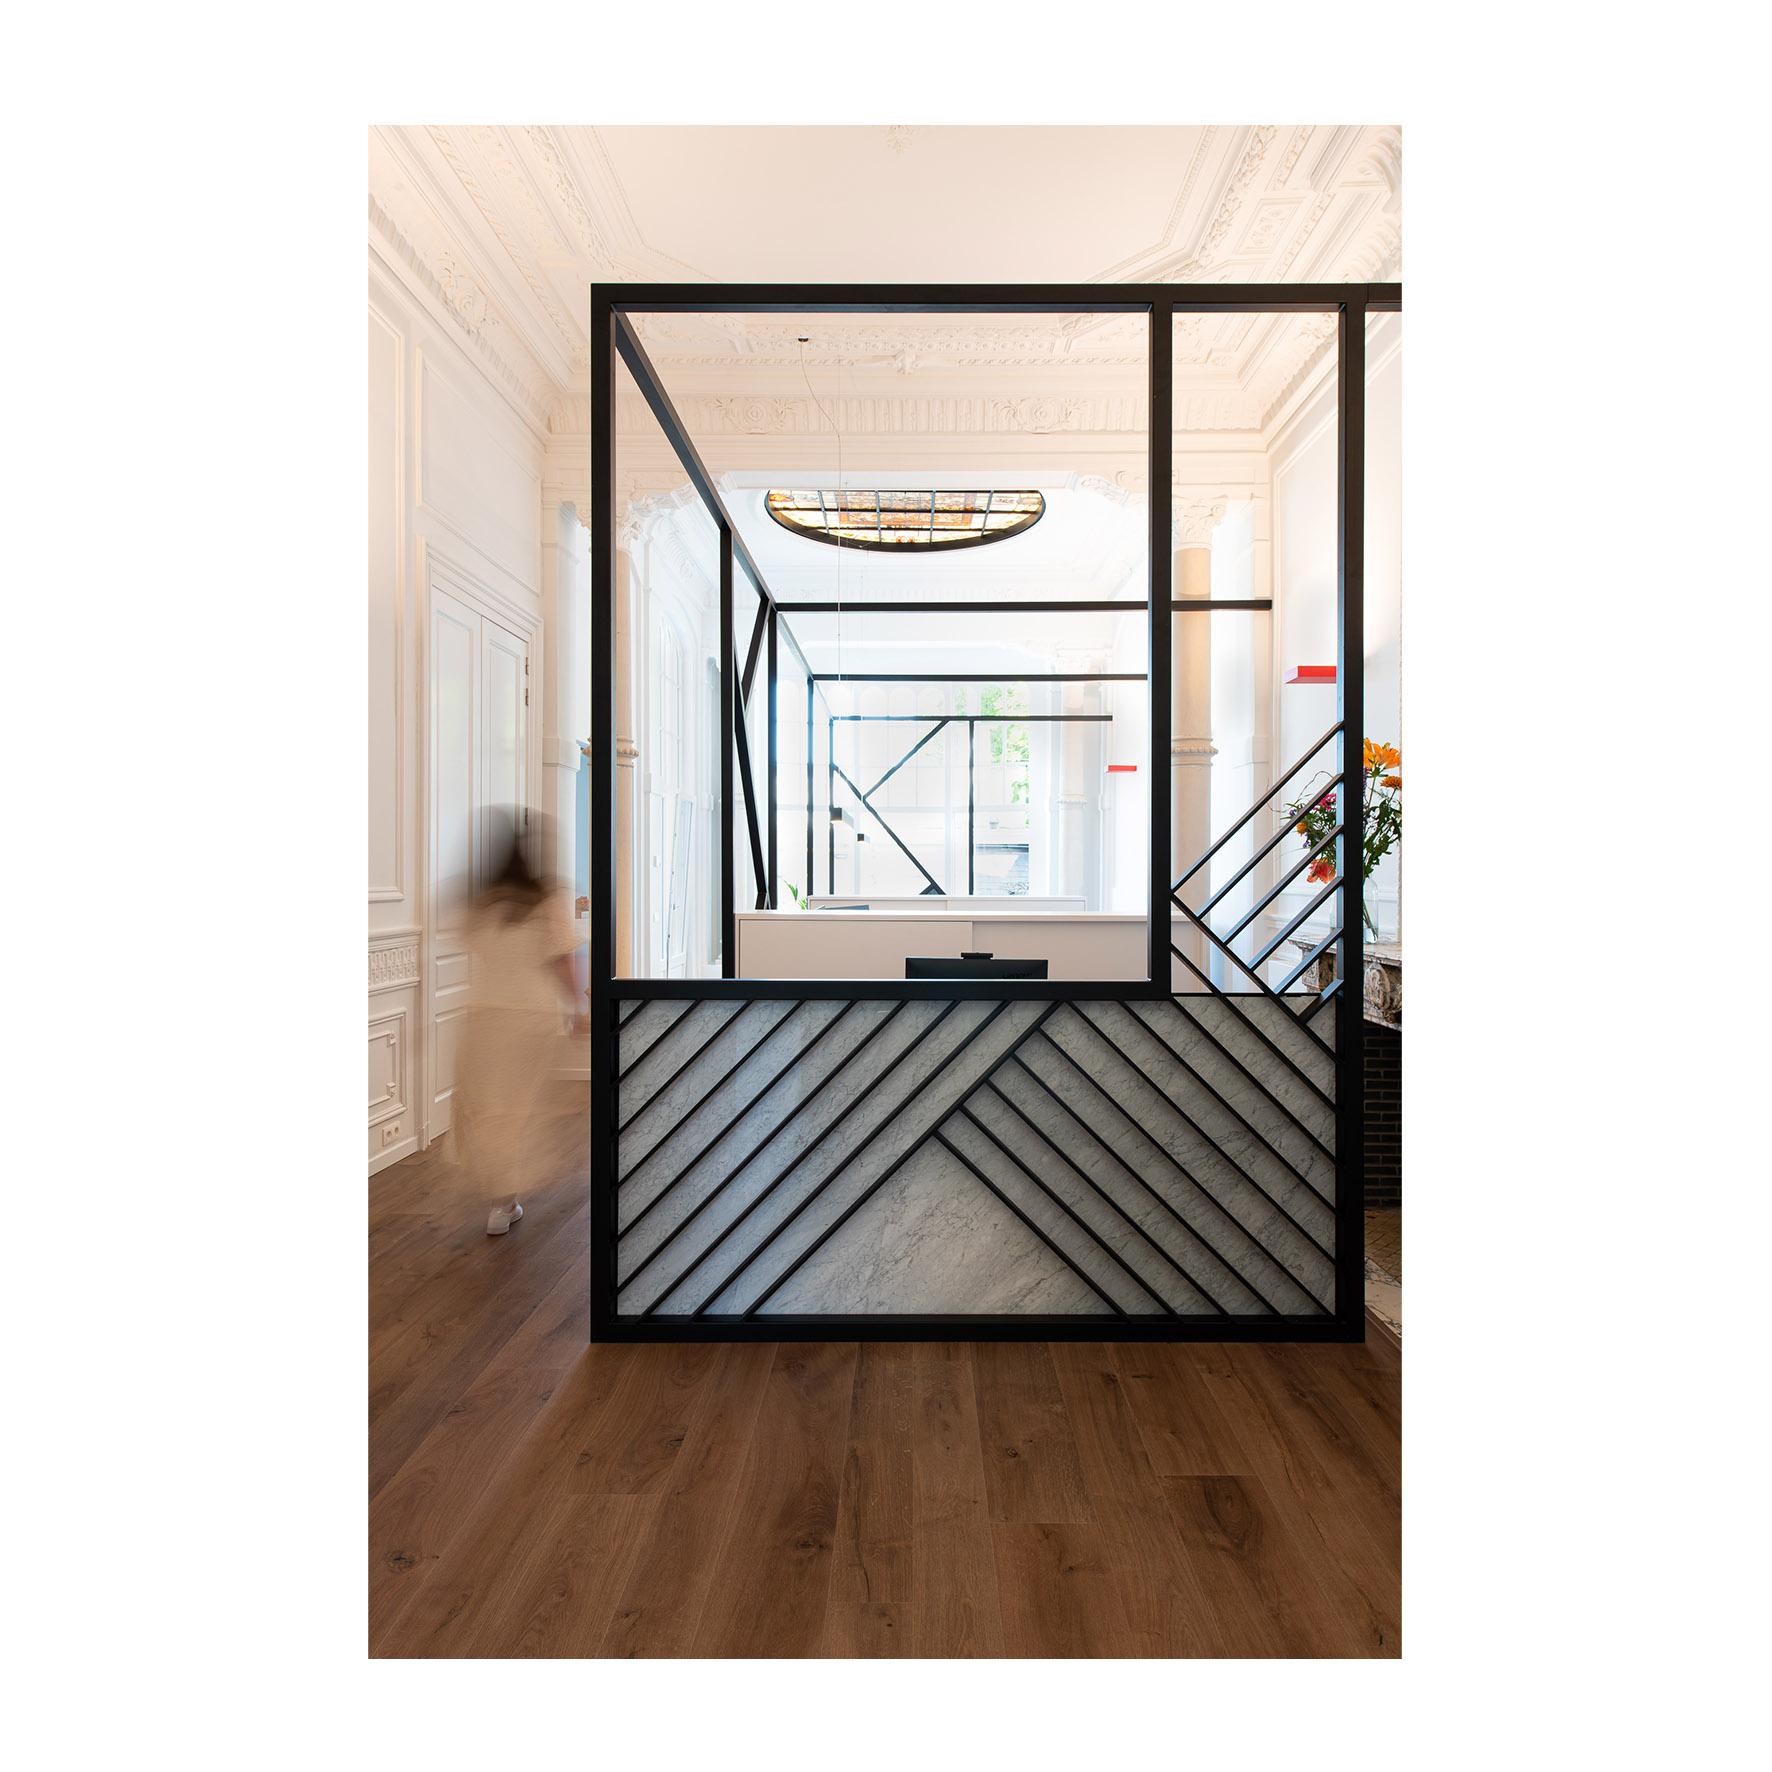 Interieurfotografie - No Nonsense Design